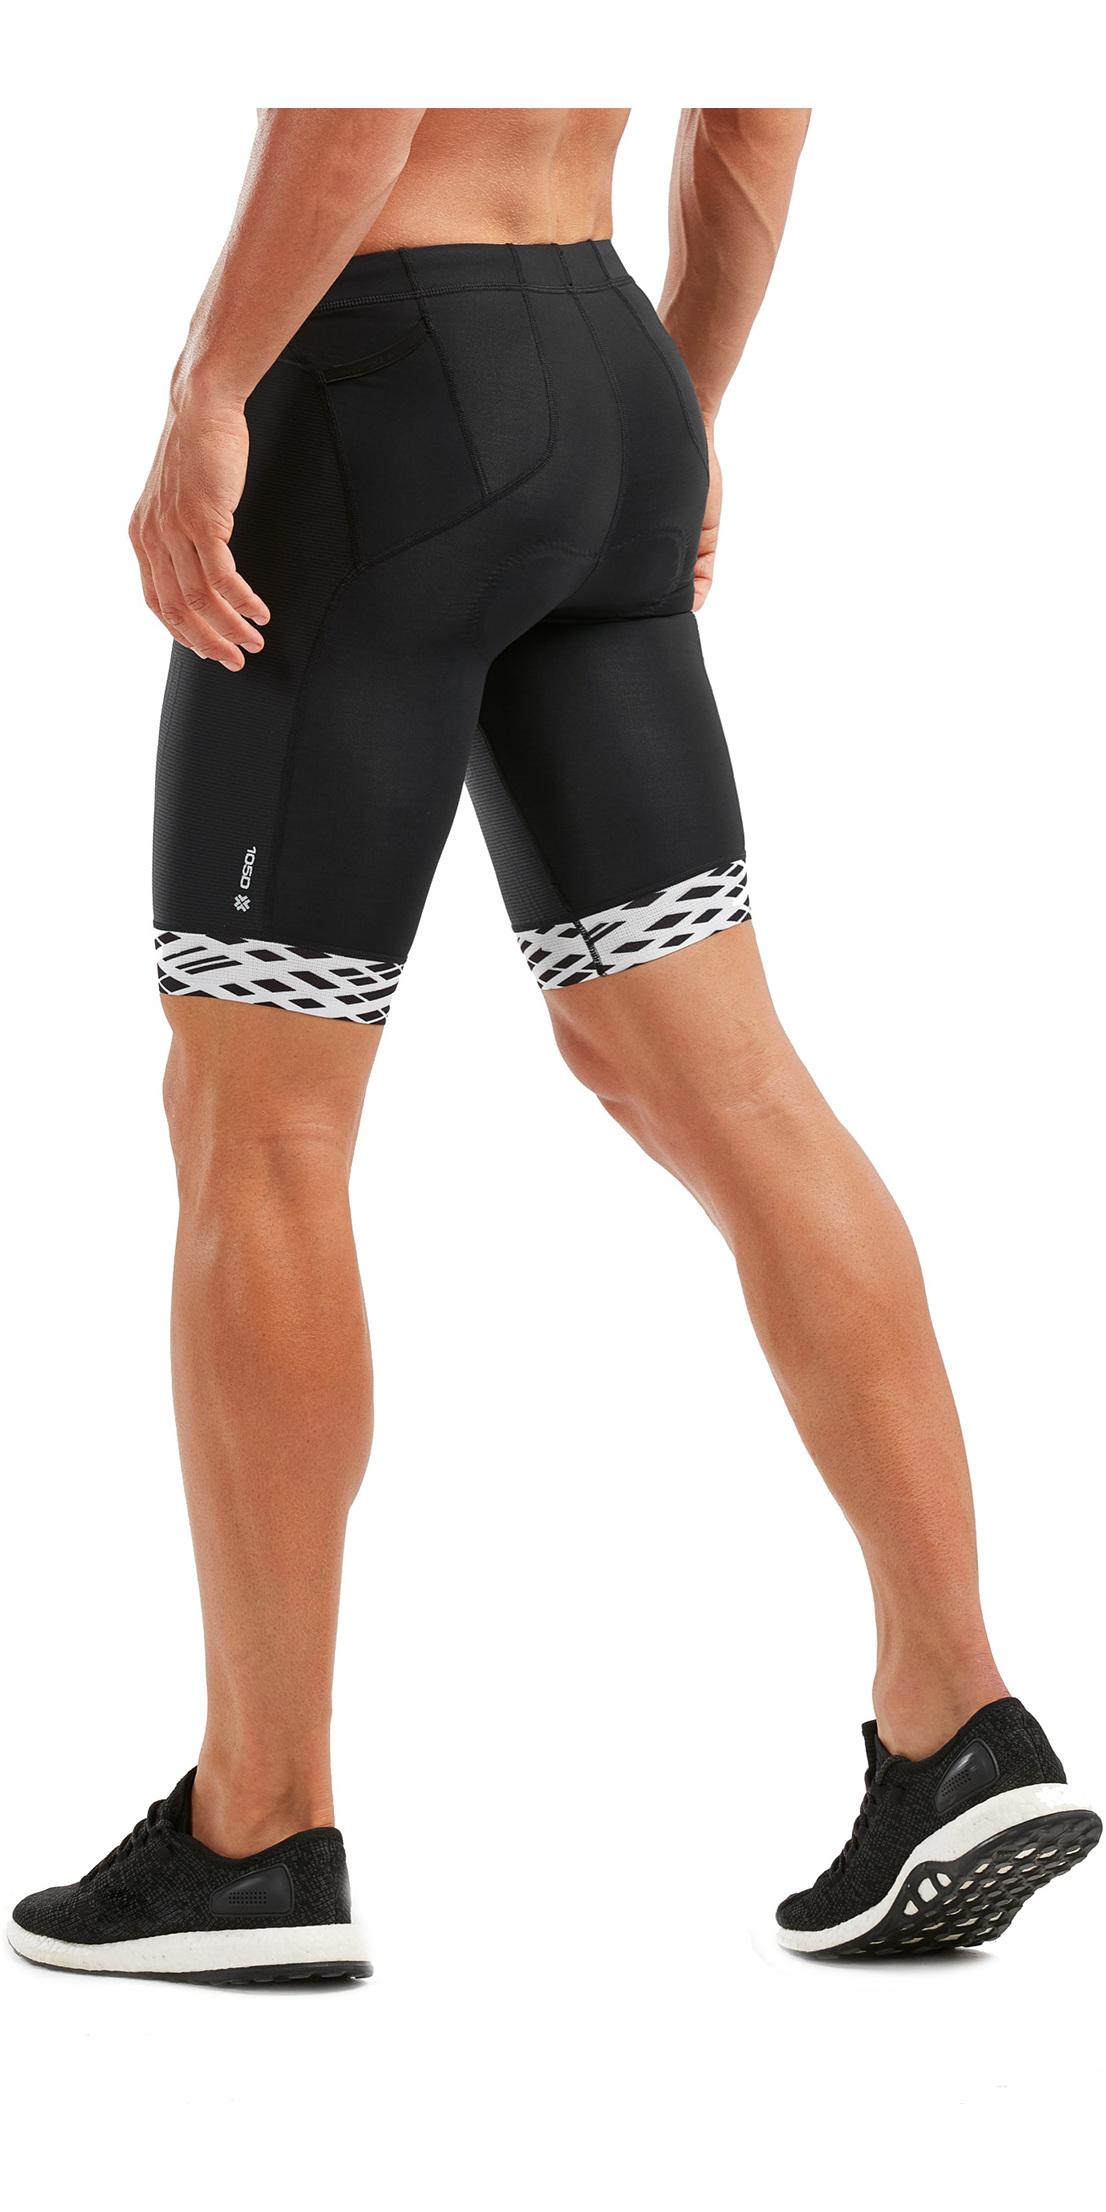 2019 2XU Mens Compression Tri Shorts Black / White Lines MT5520b